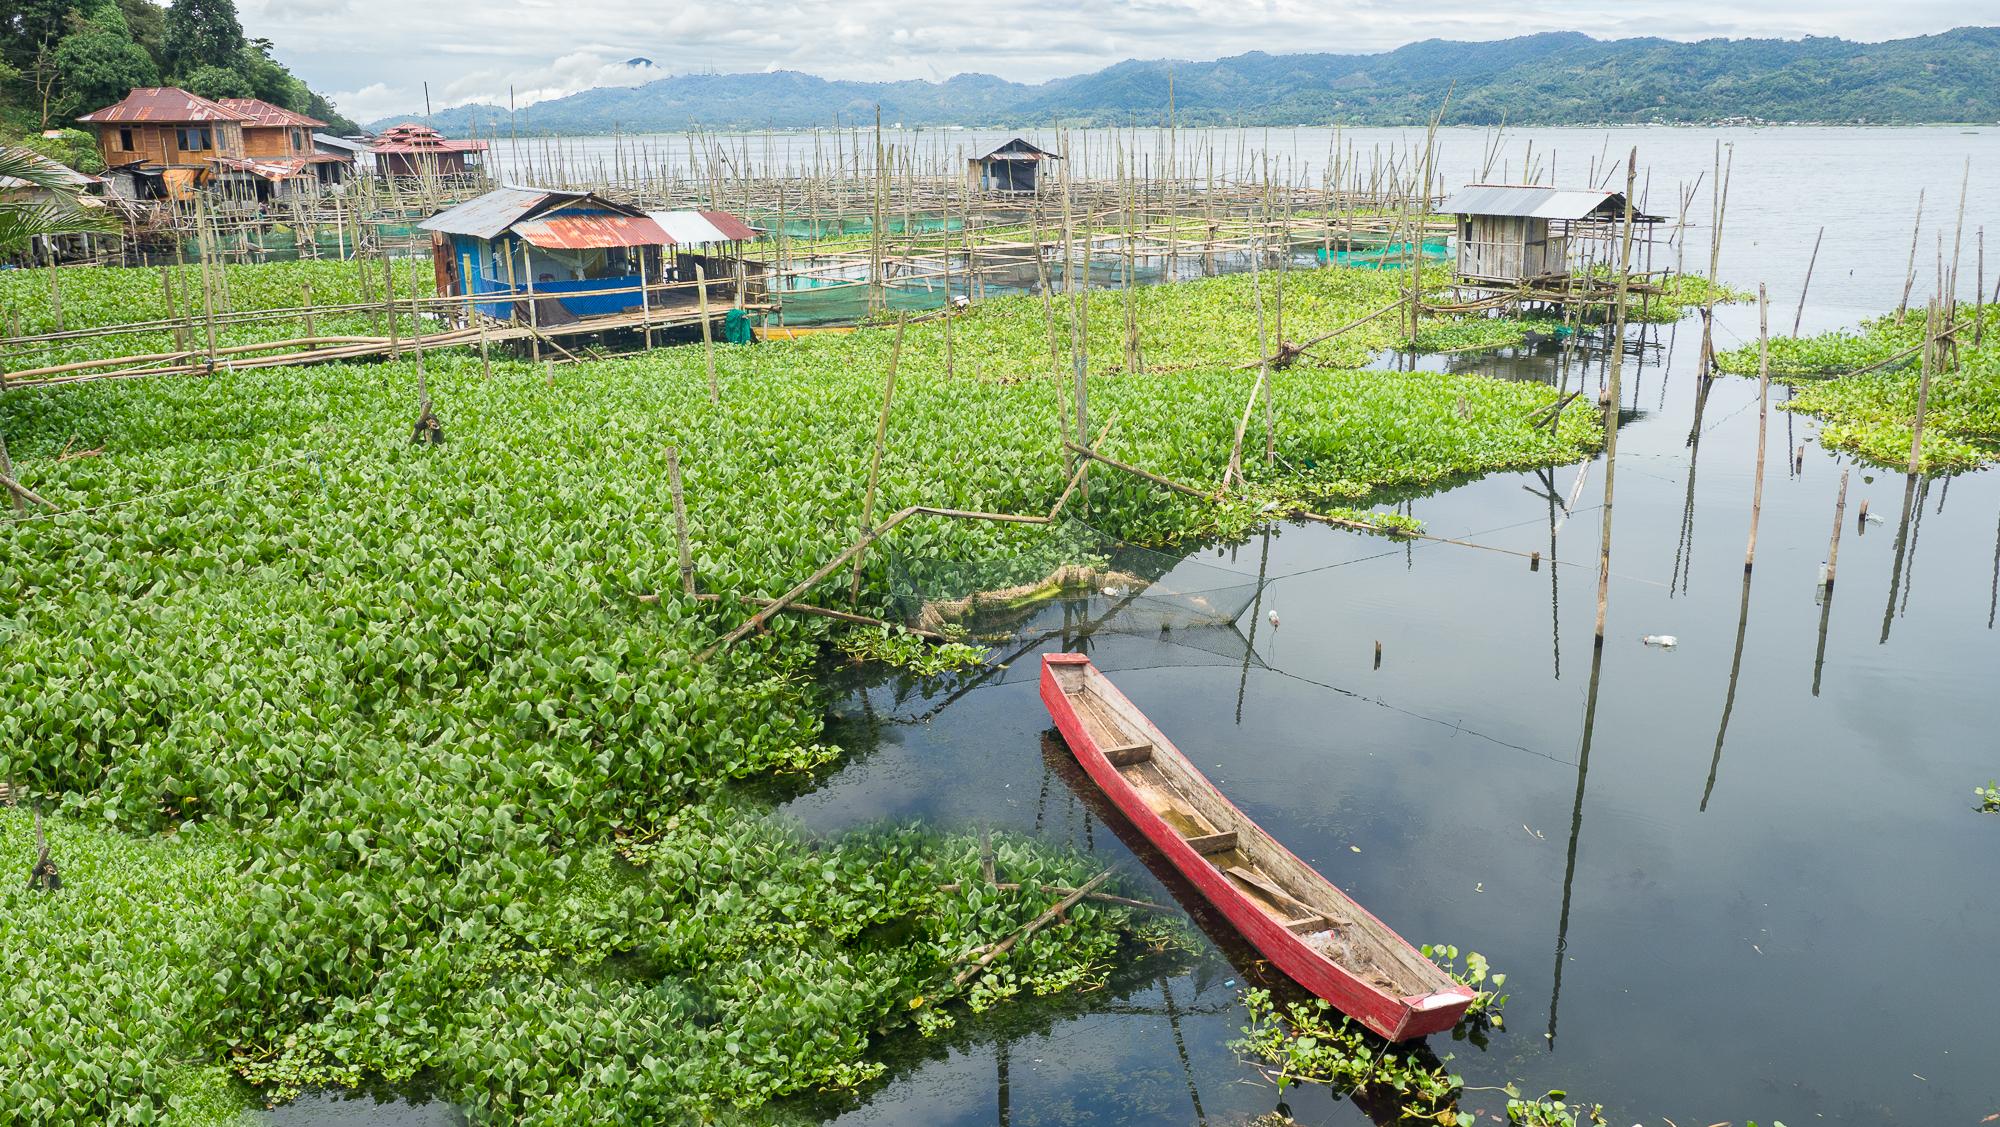 Poso lake, Indonesia